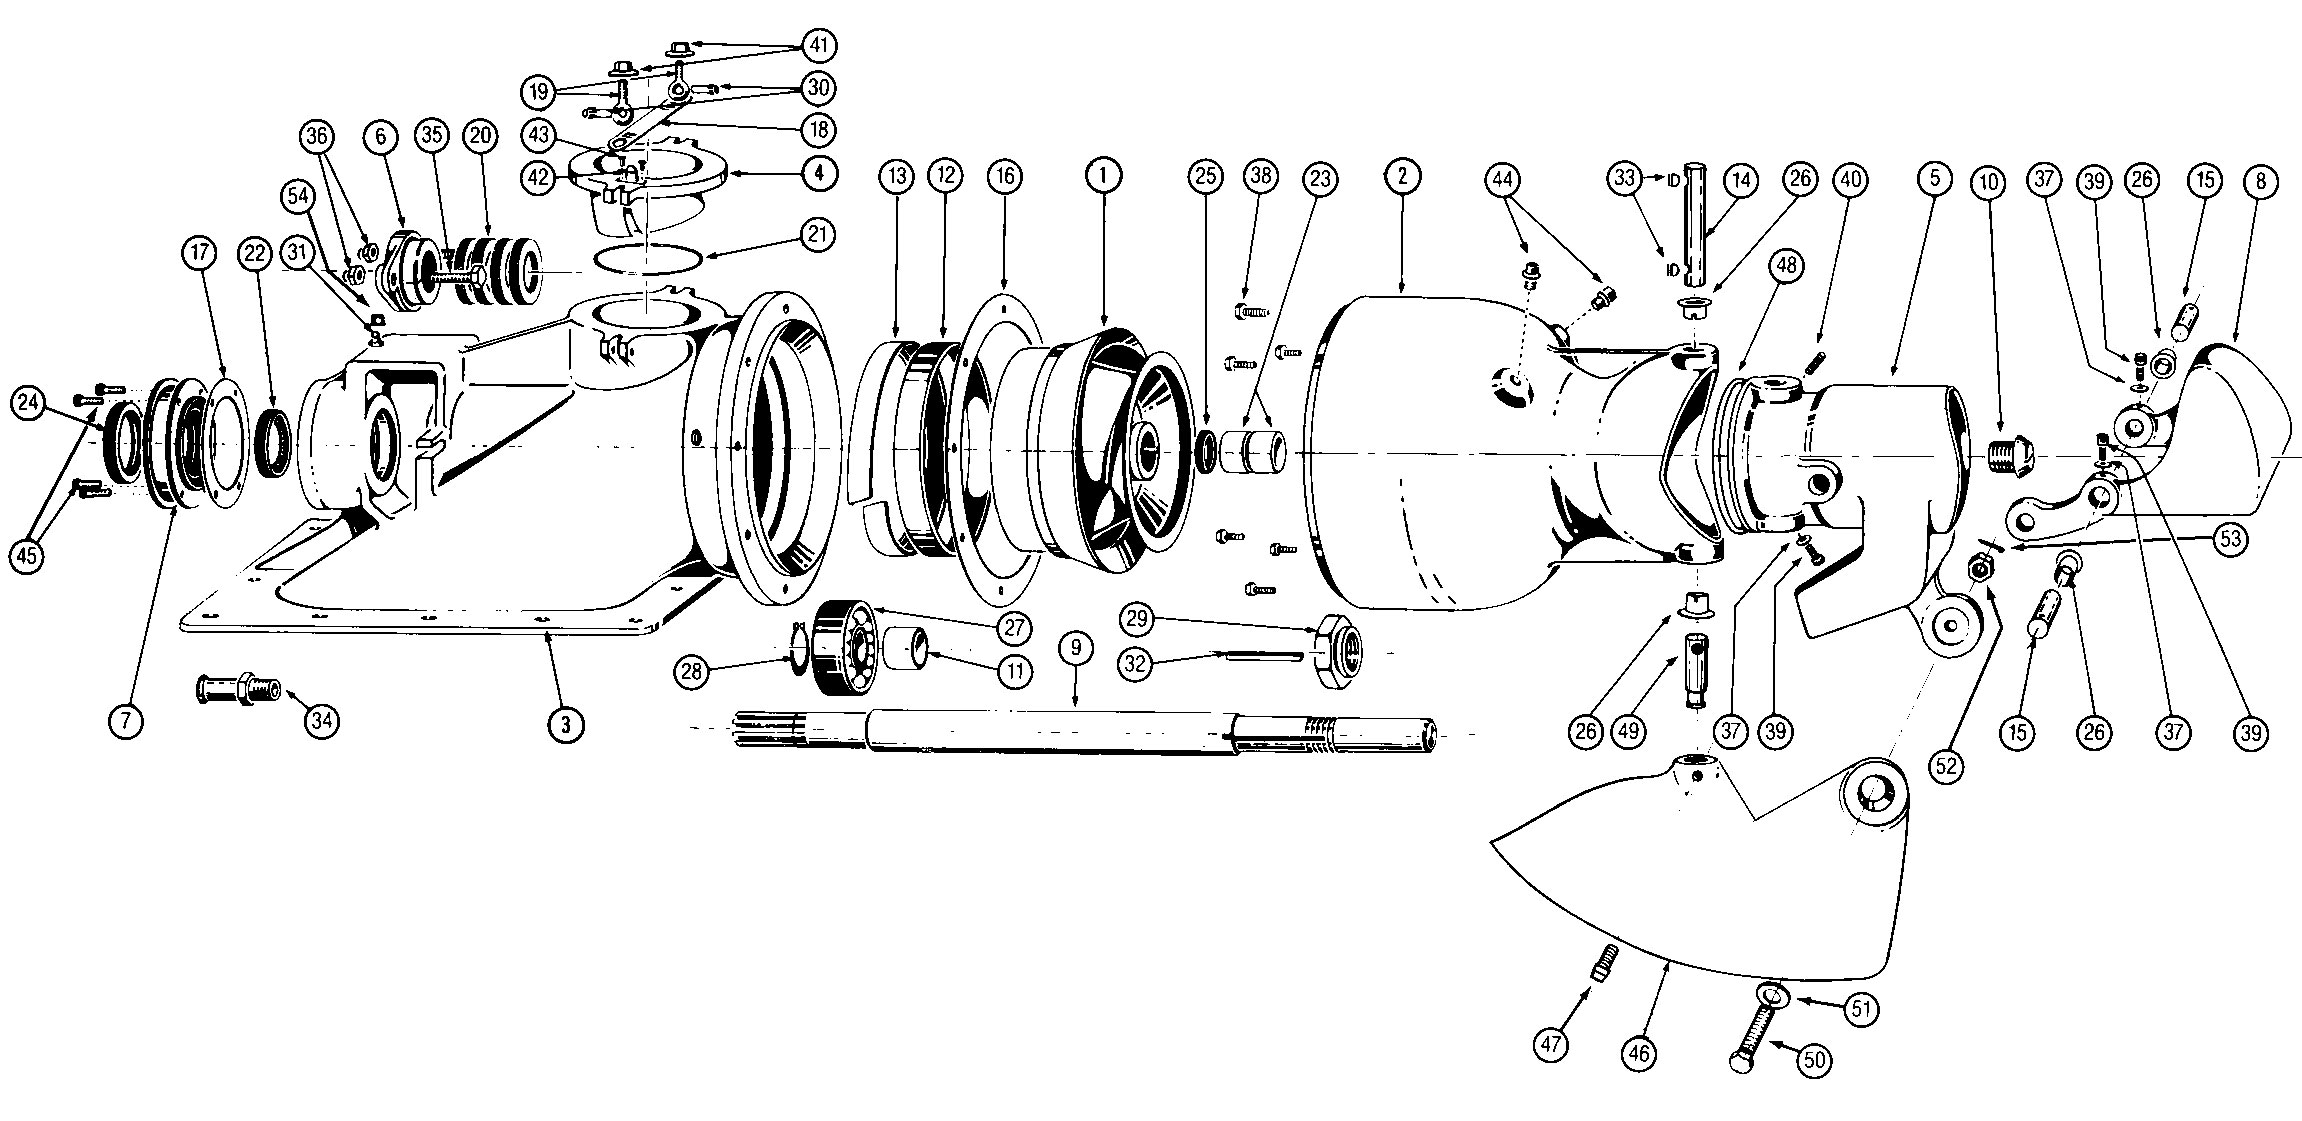 centrifugal pump mechanical seal diagram harley davidson wiring diagrams and schematics